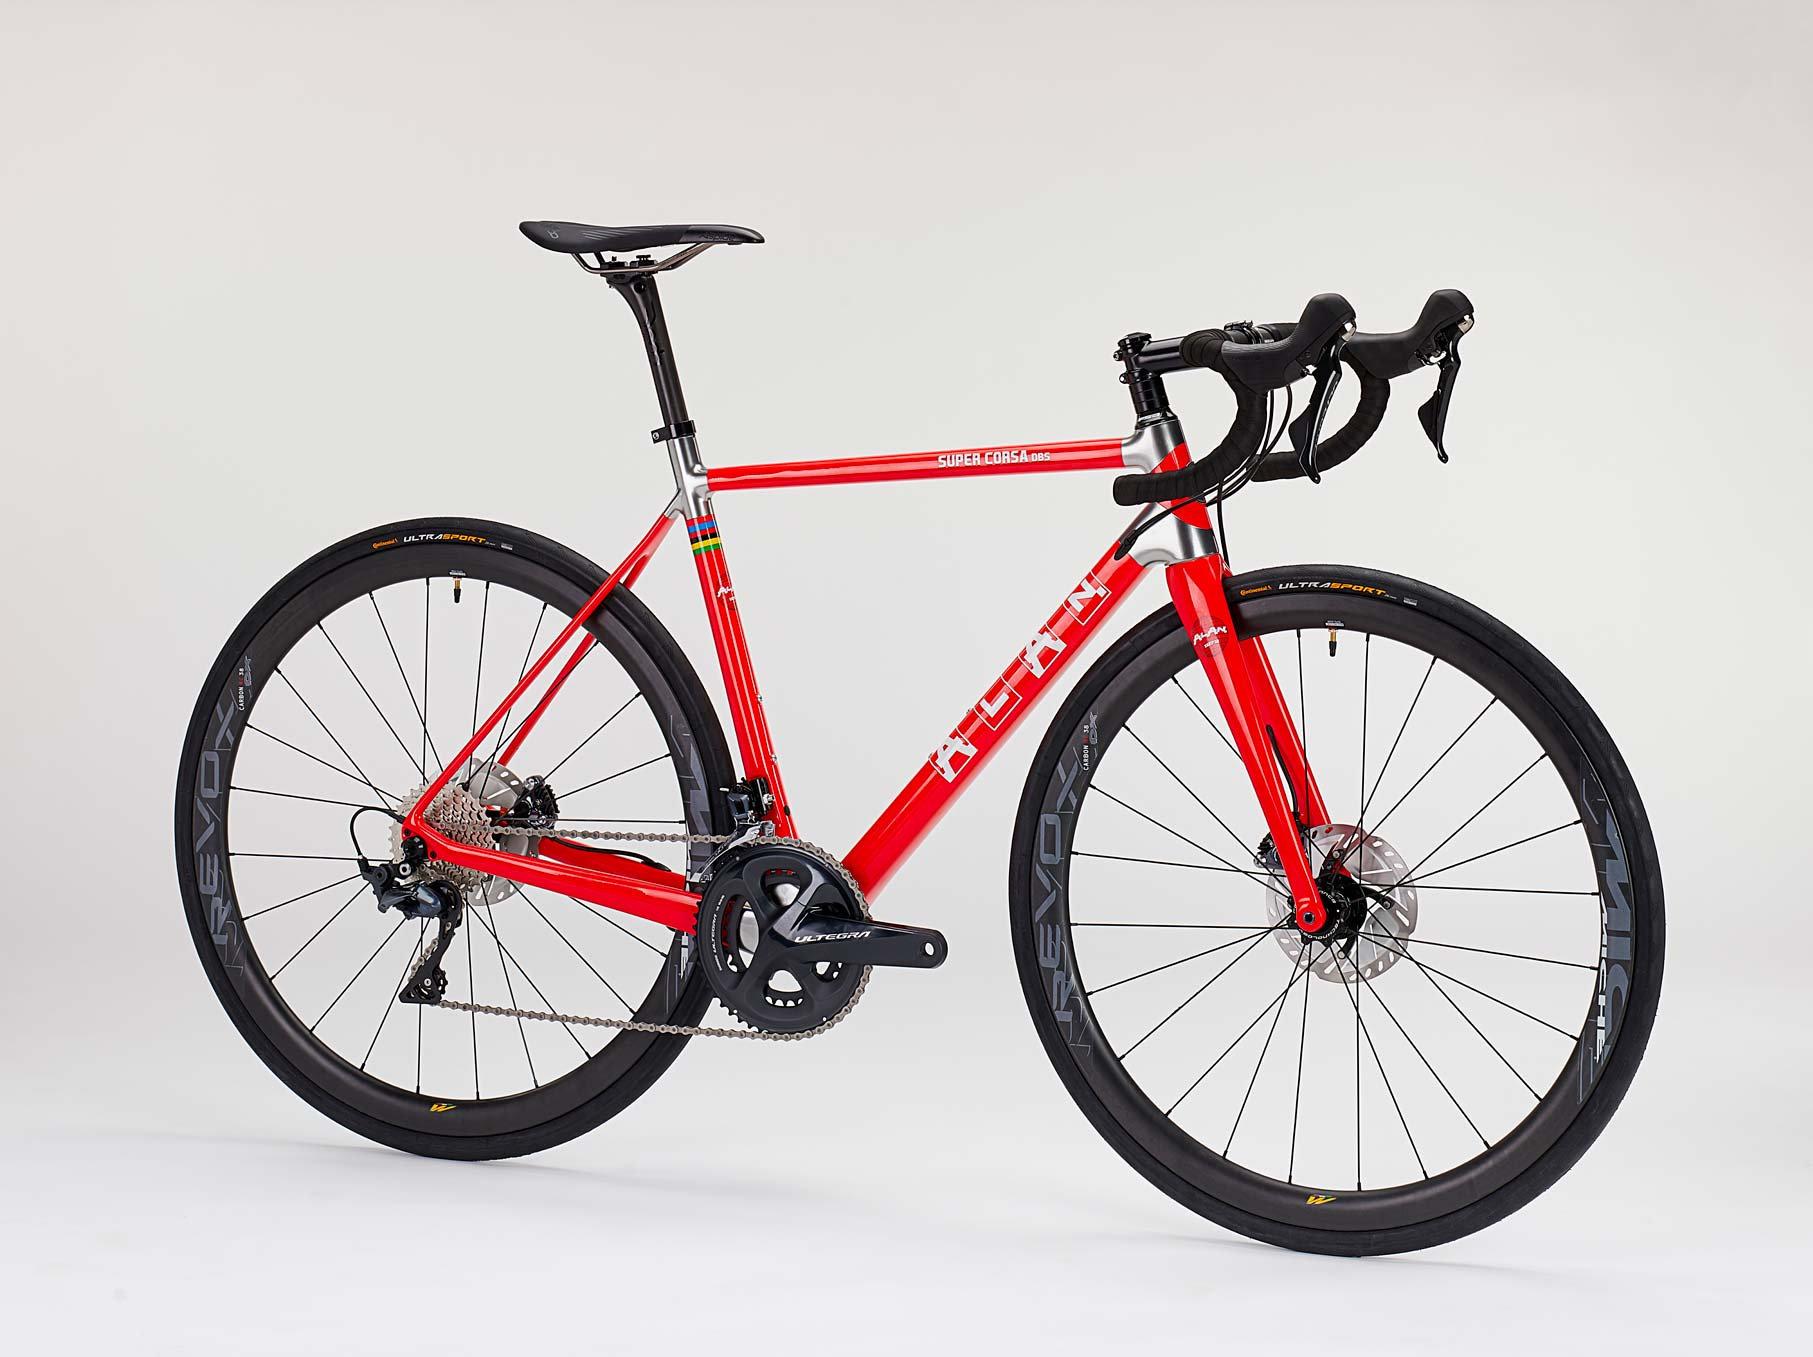 ALAN Super Corsa DBS (Frameset) | velosport-imports